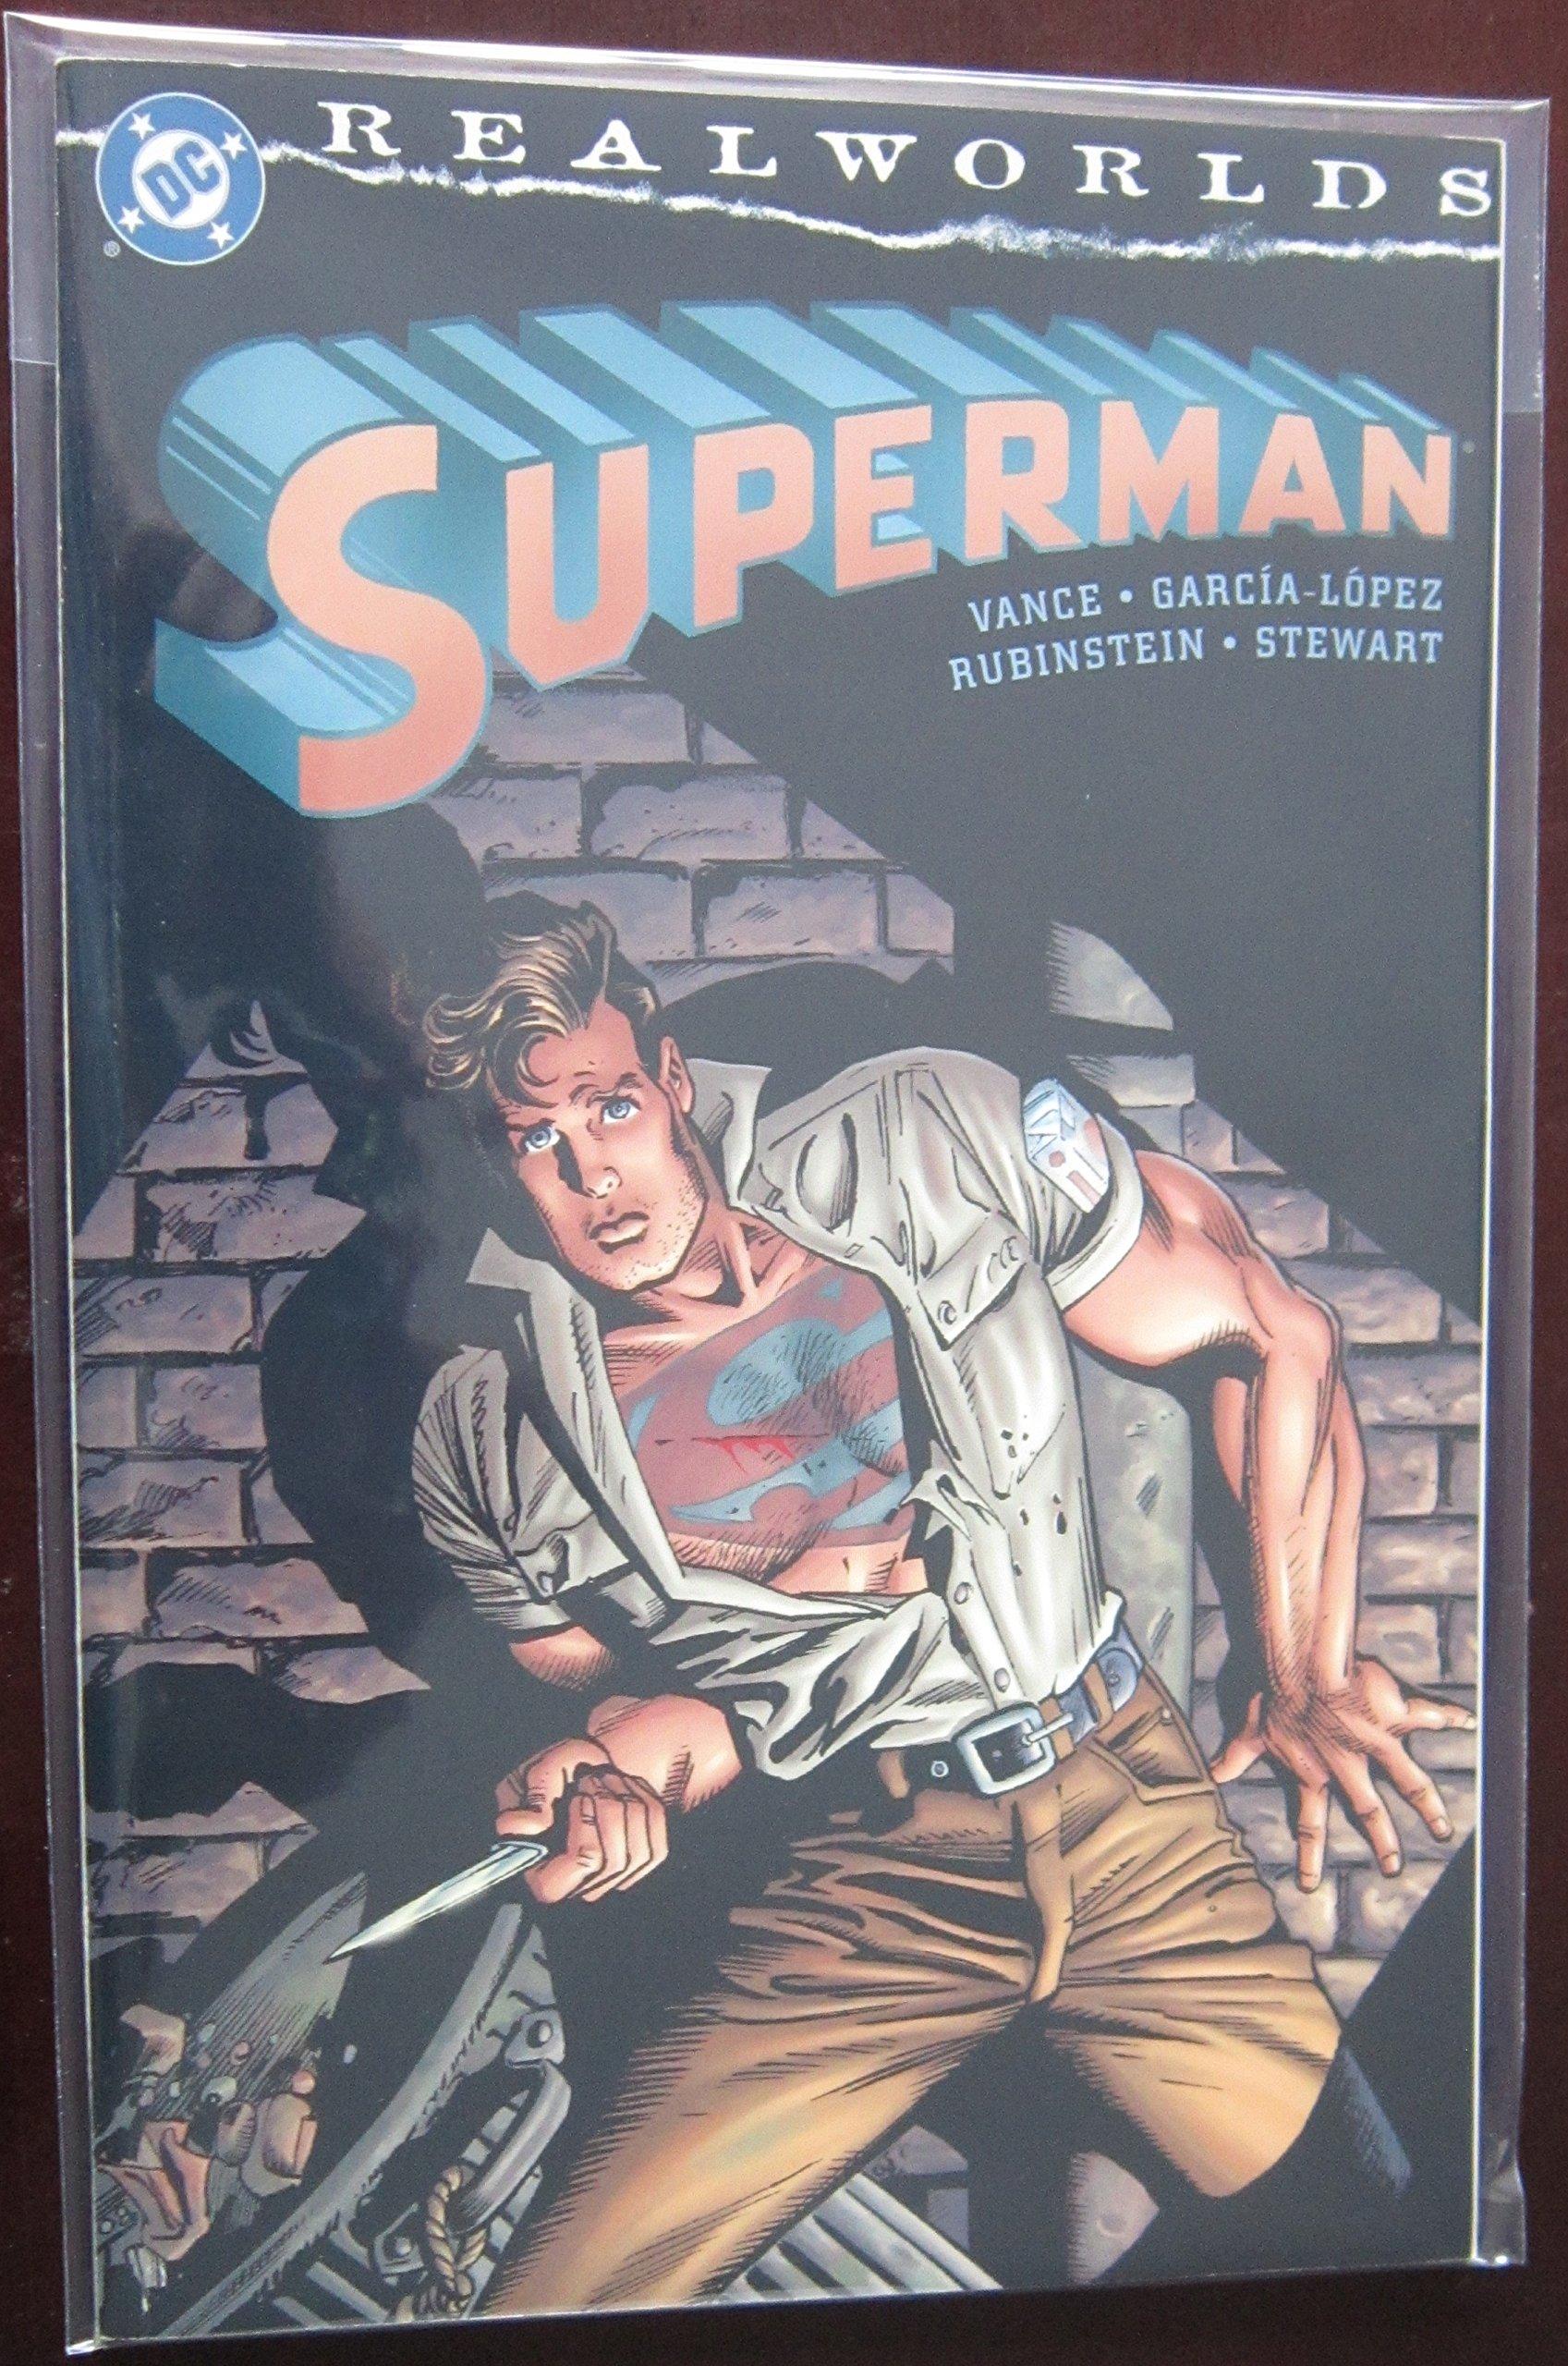 Download Realworlds Superman #1 PDF